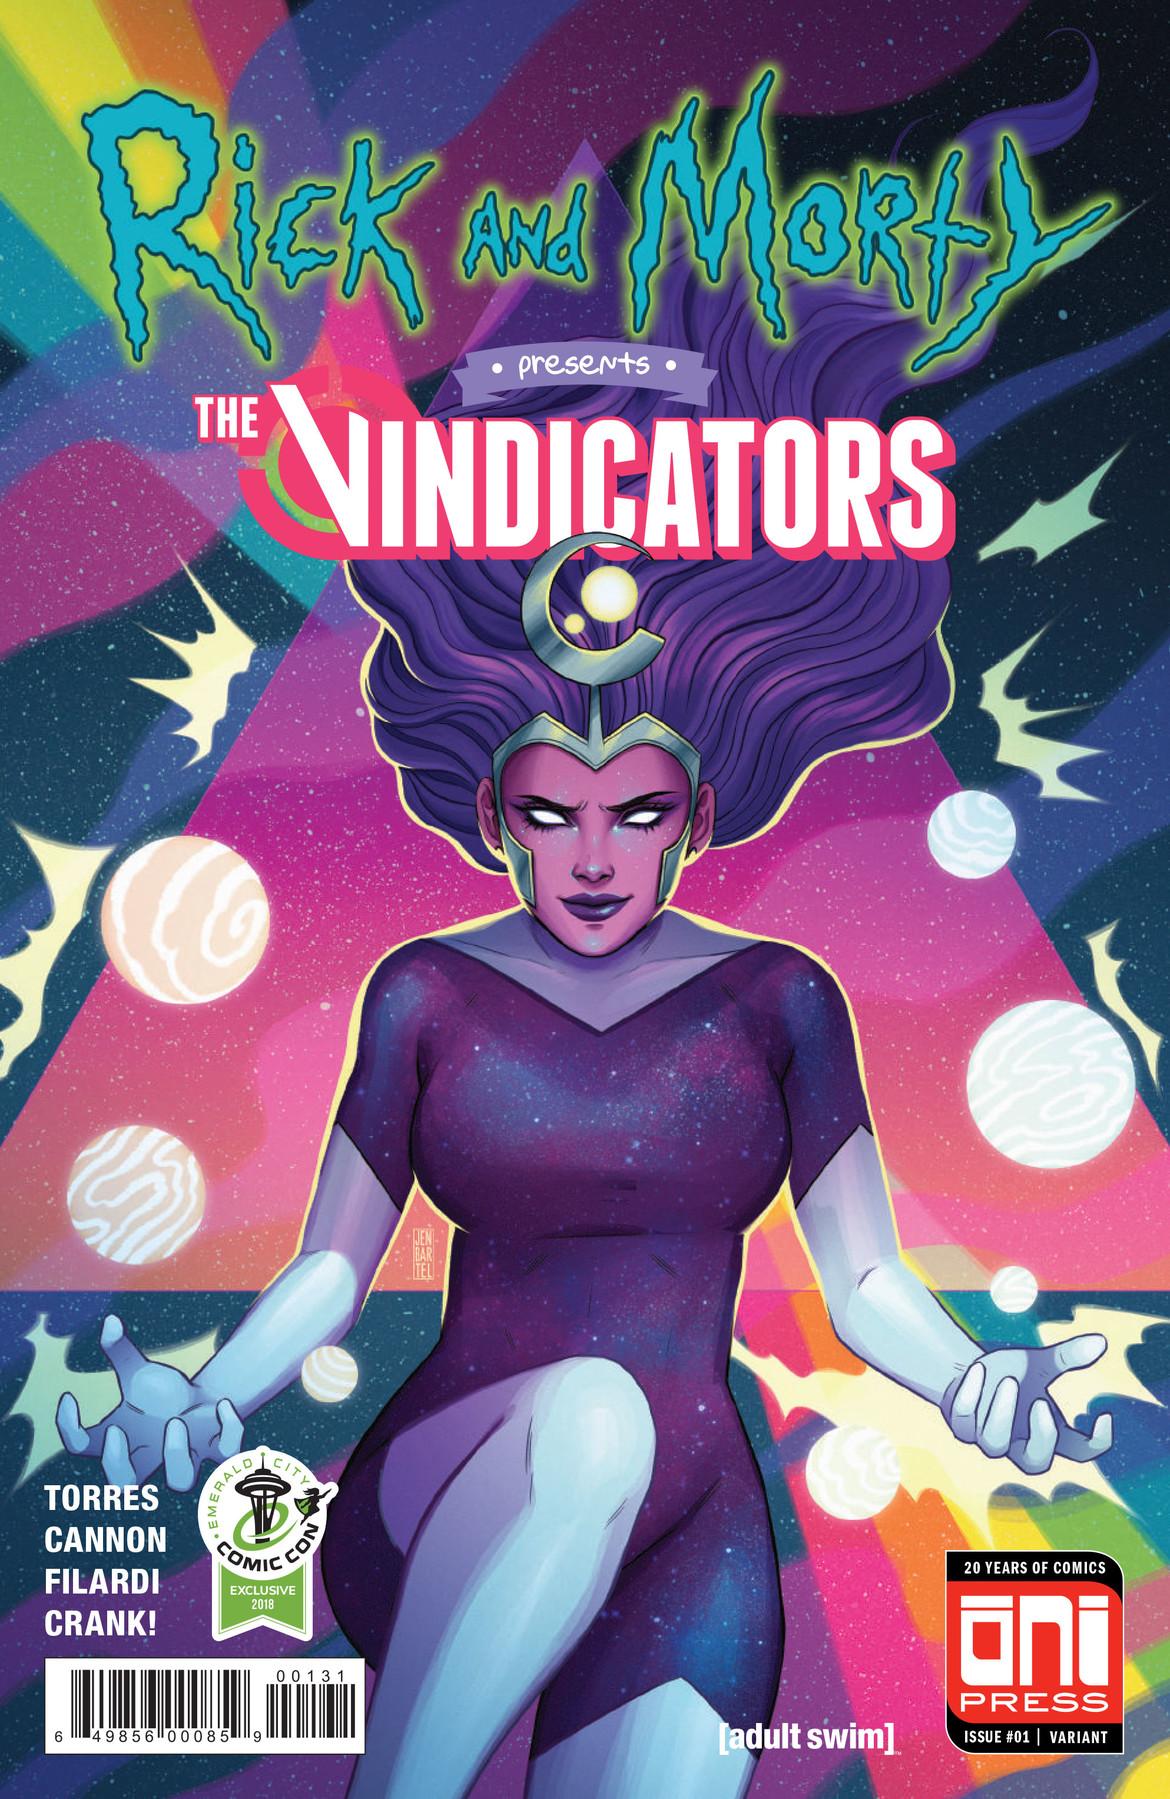 Rick and Morty Presents The Vindicators comic- ECCC cover by Jen Bartel